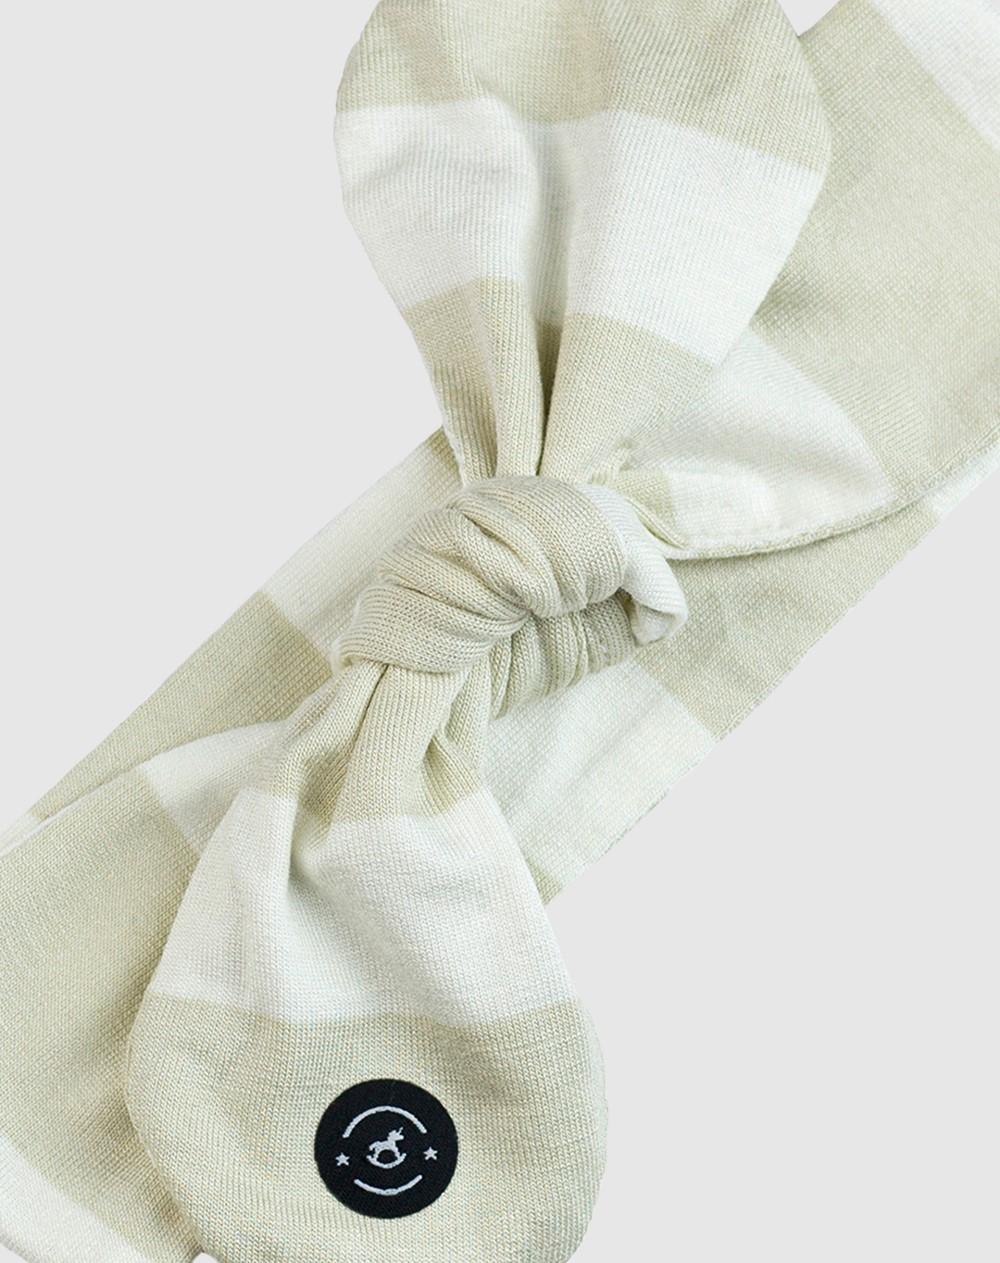 Penka Knot Mulan